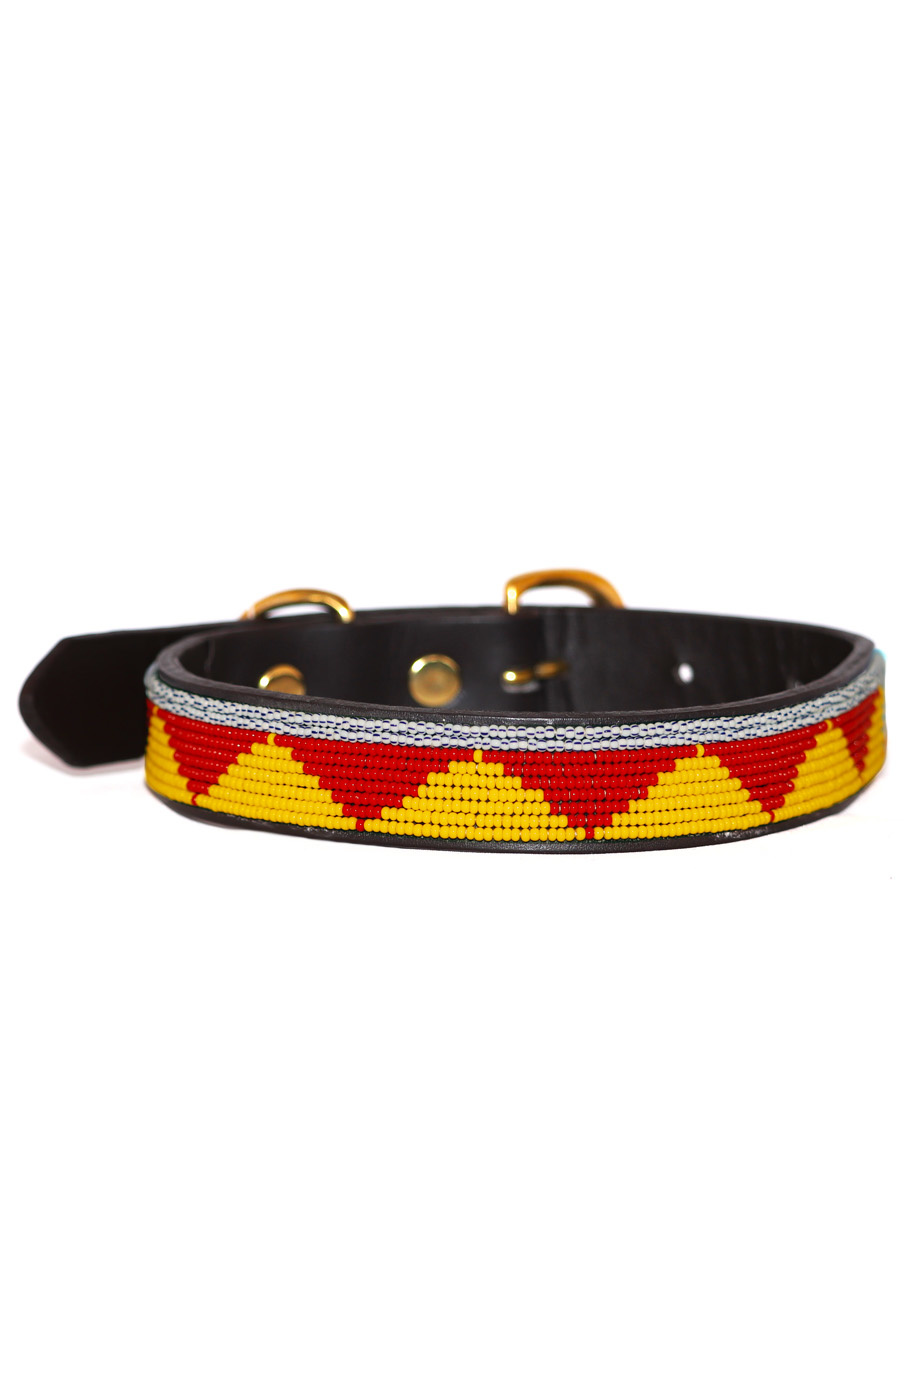 Pet Collar Spring Yellow/Red Medium-1